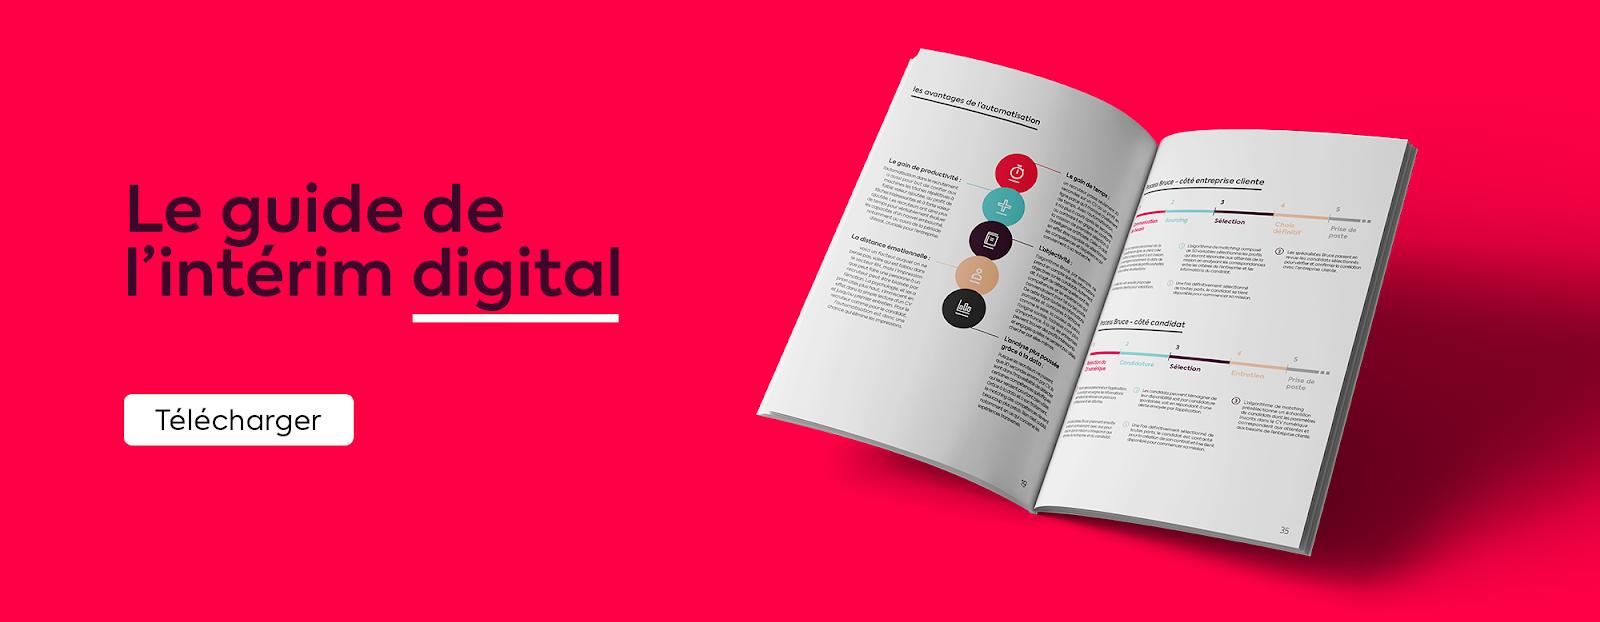 Livre blanc du recrutement digital